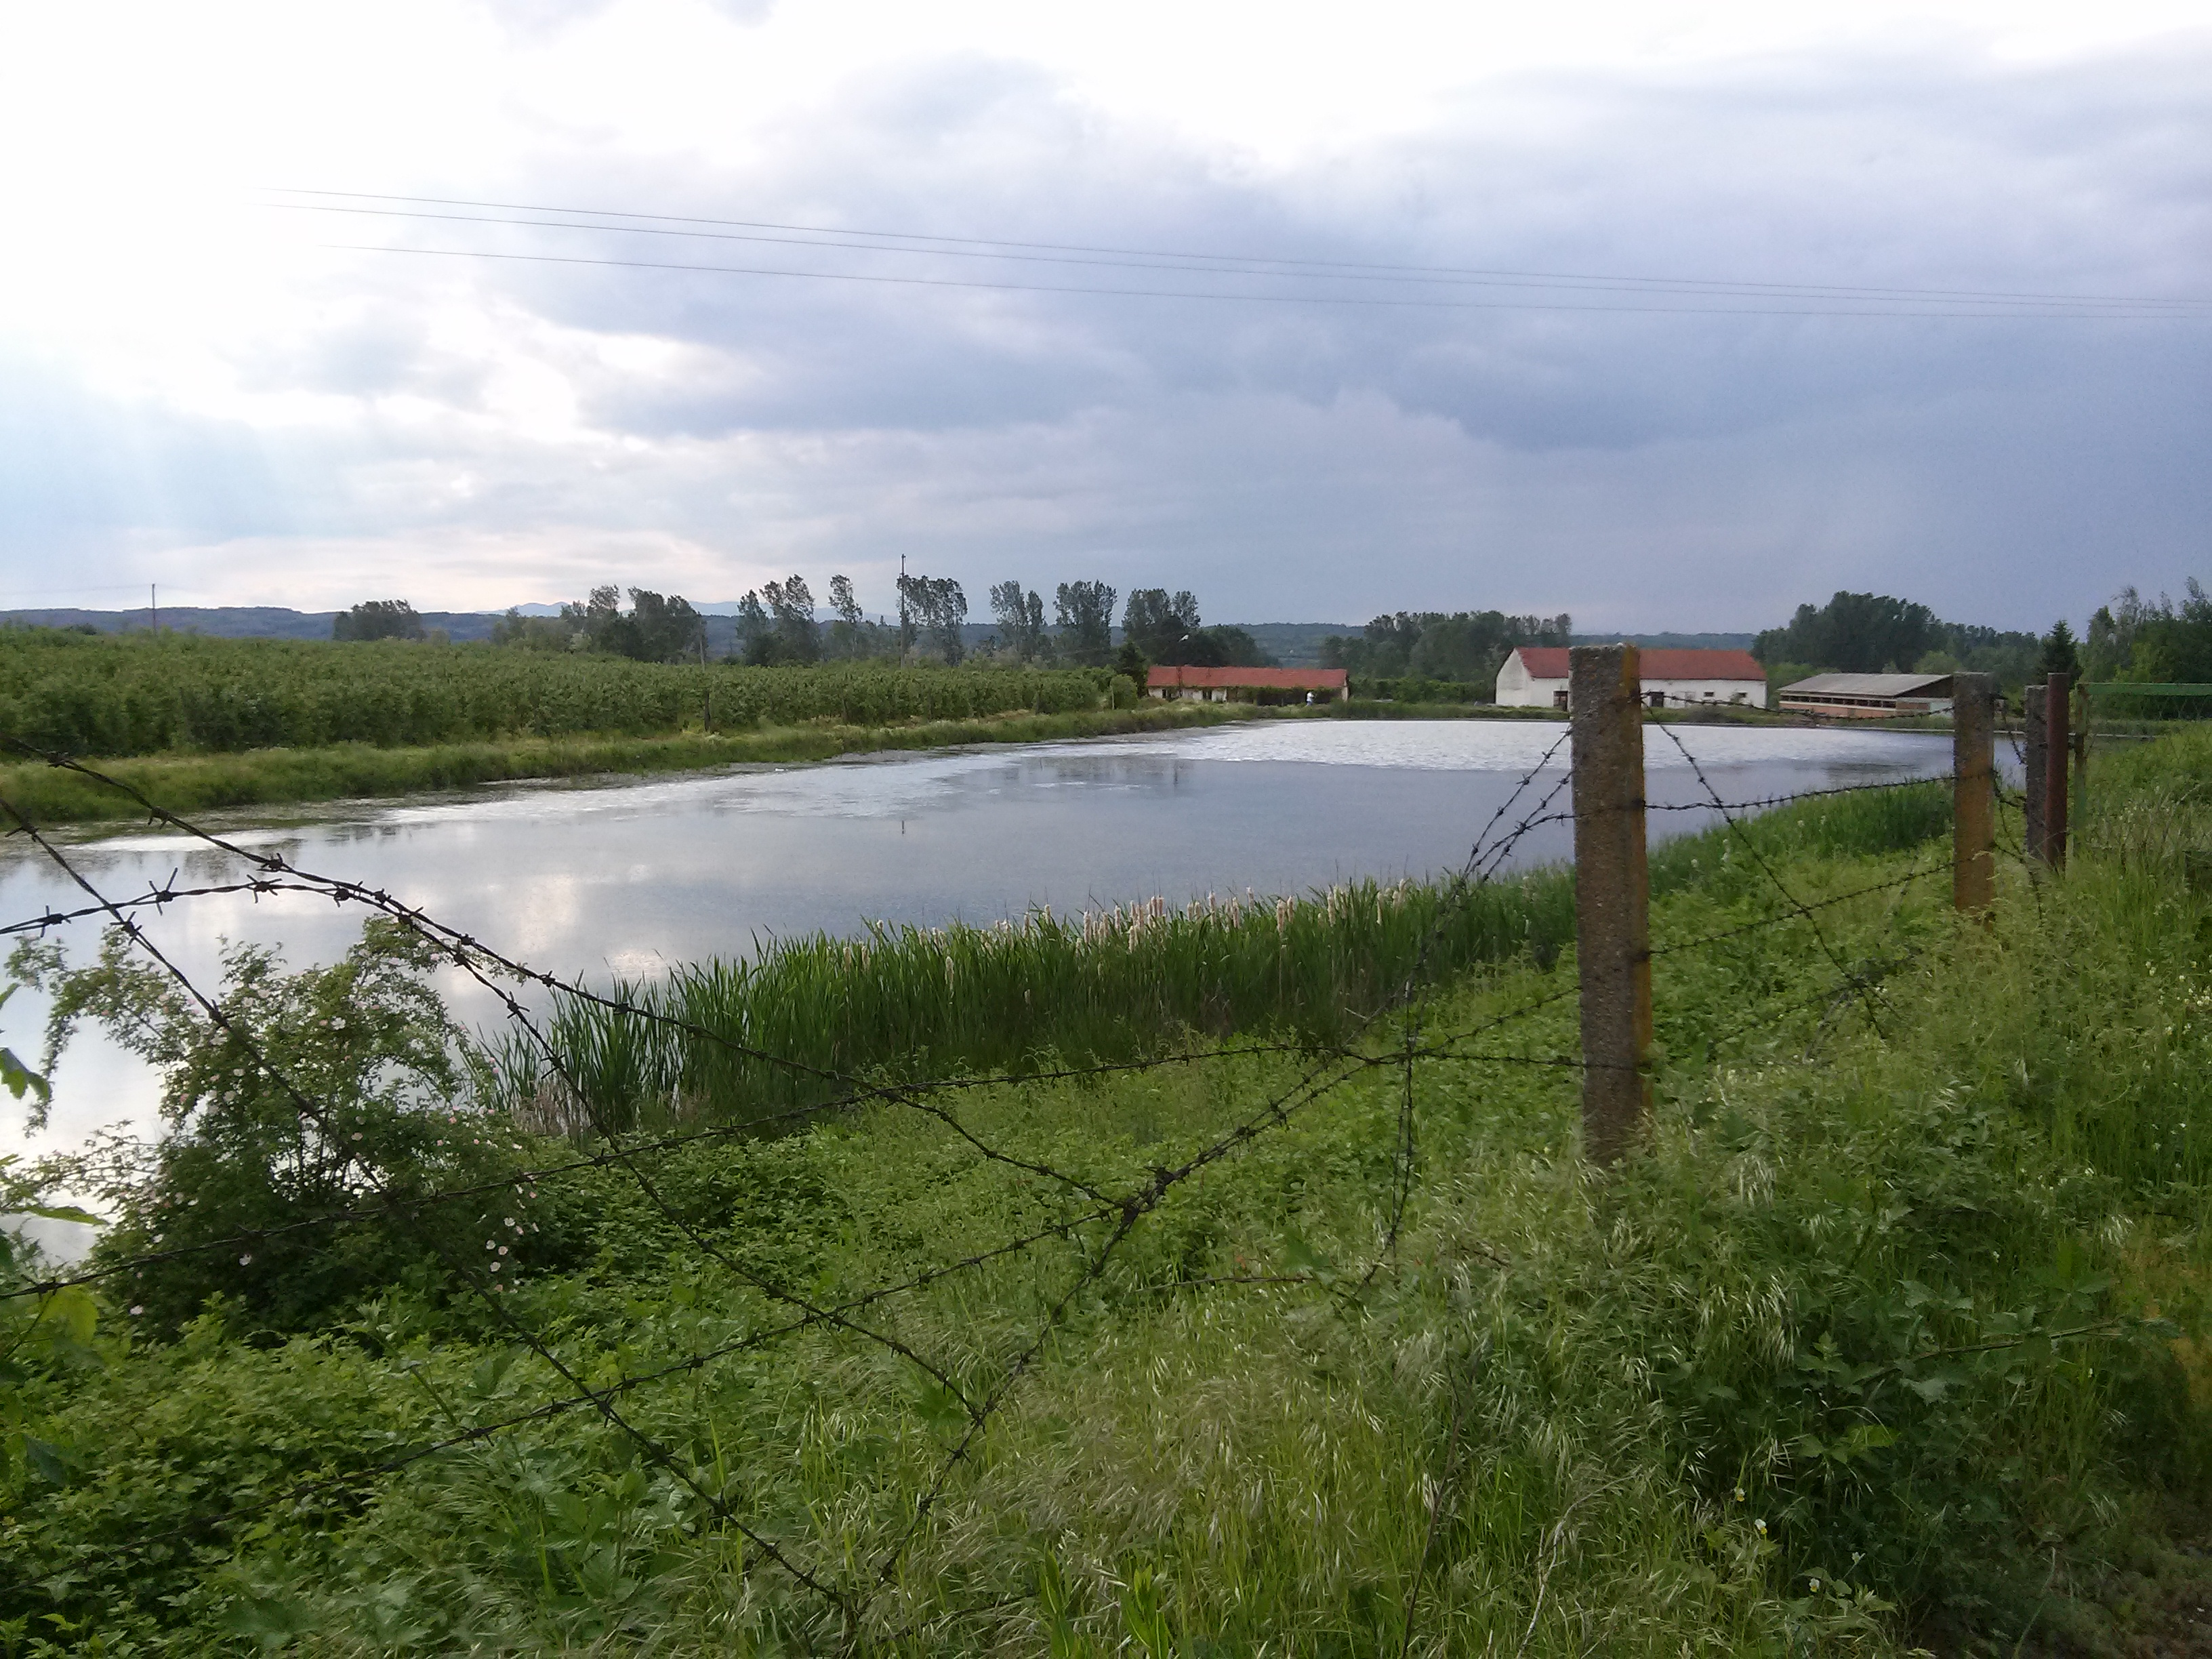 File:Veštačko jezero, Beli Potok 03.jpg